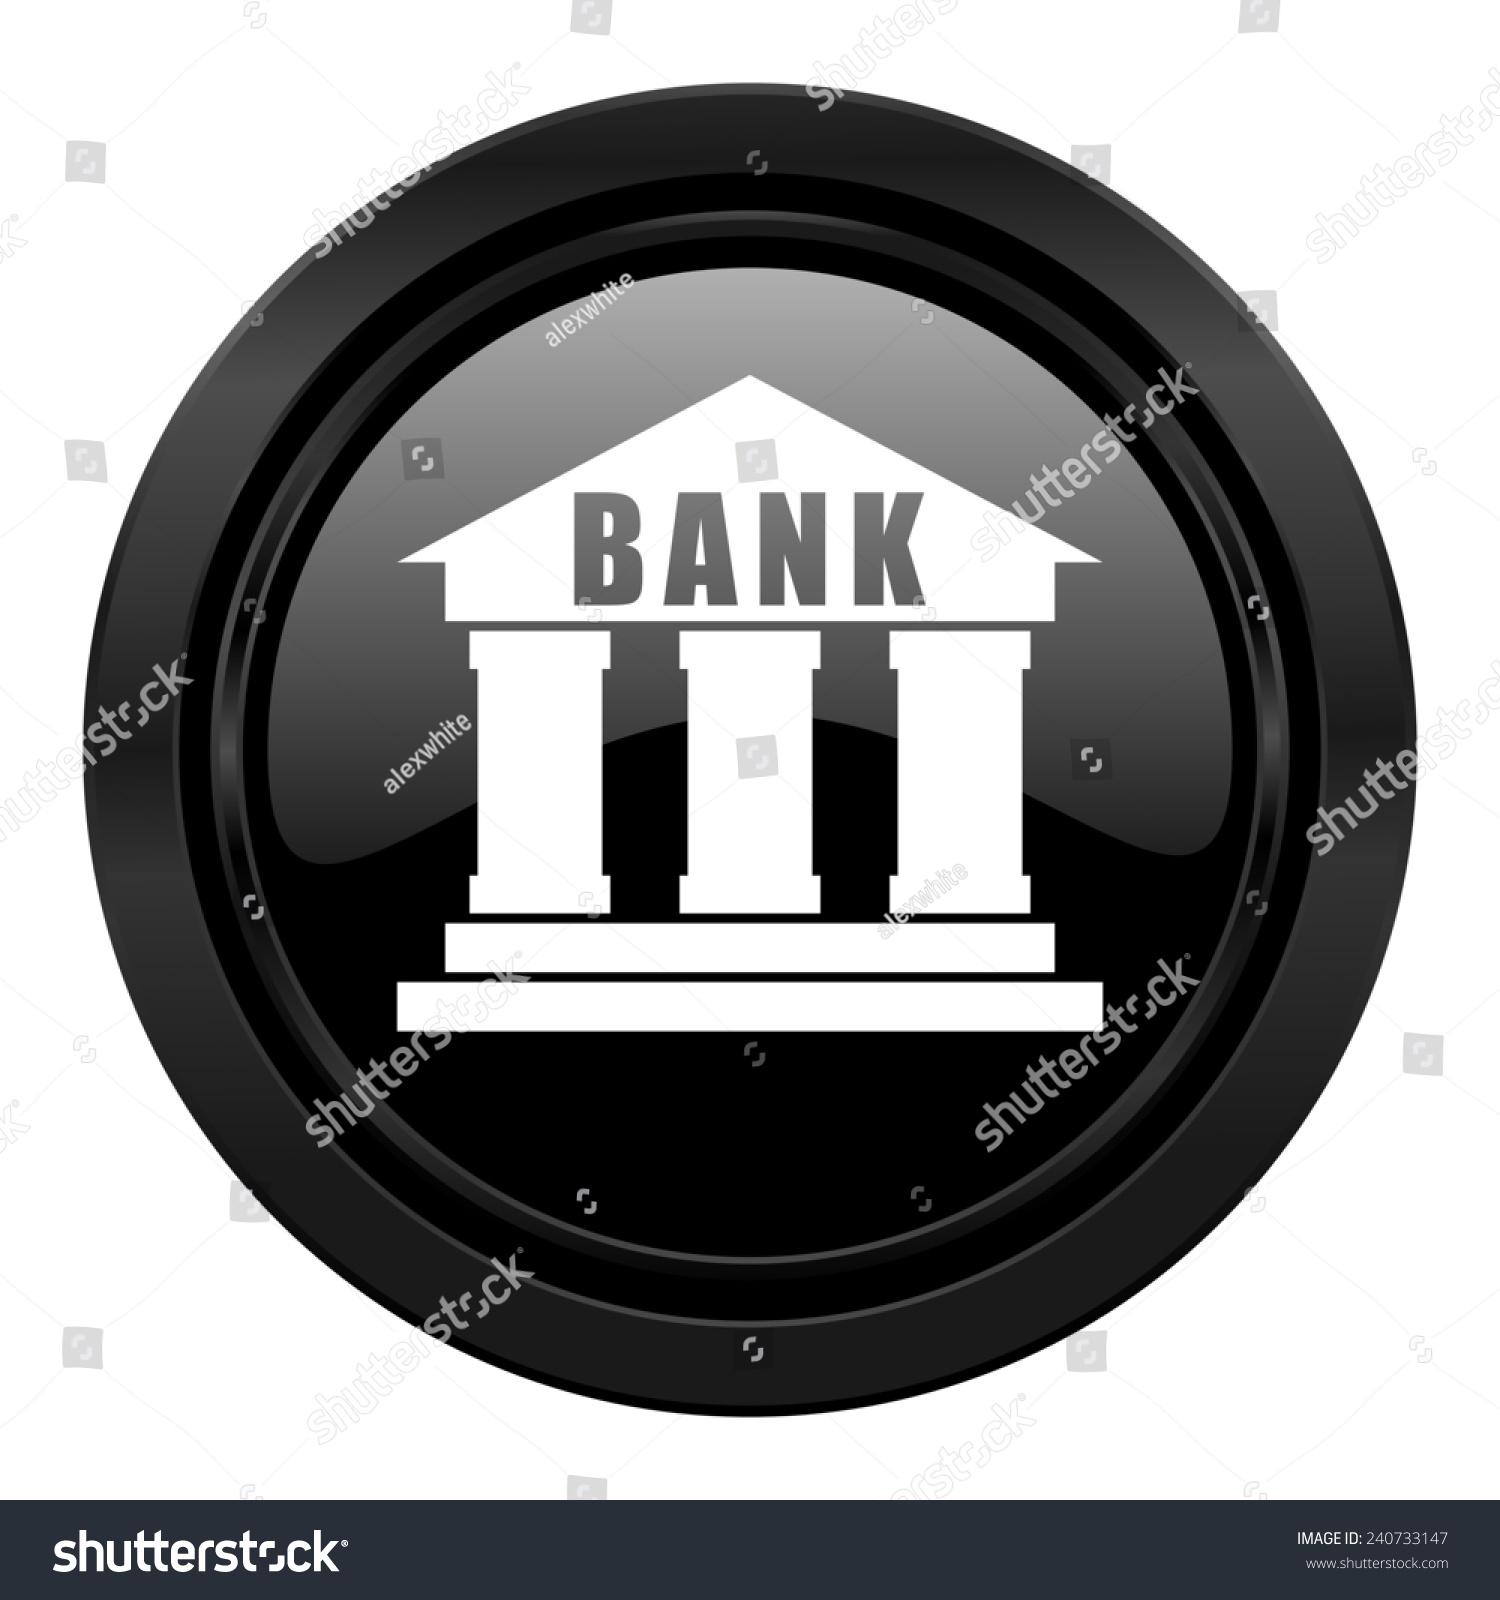 Bank Black Icon Stock Illustration 240733147 - Shutterstock